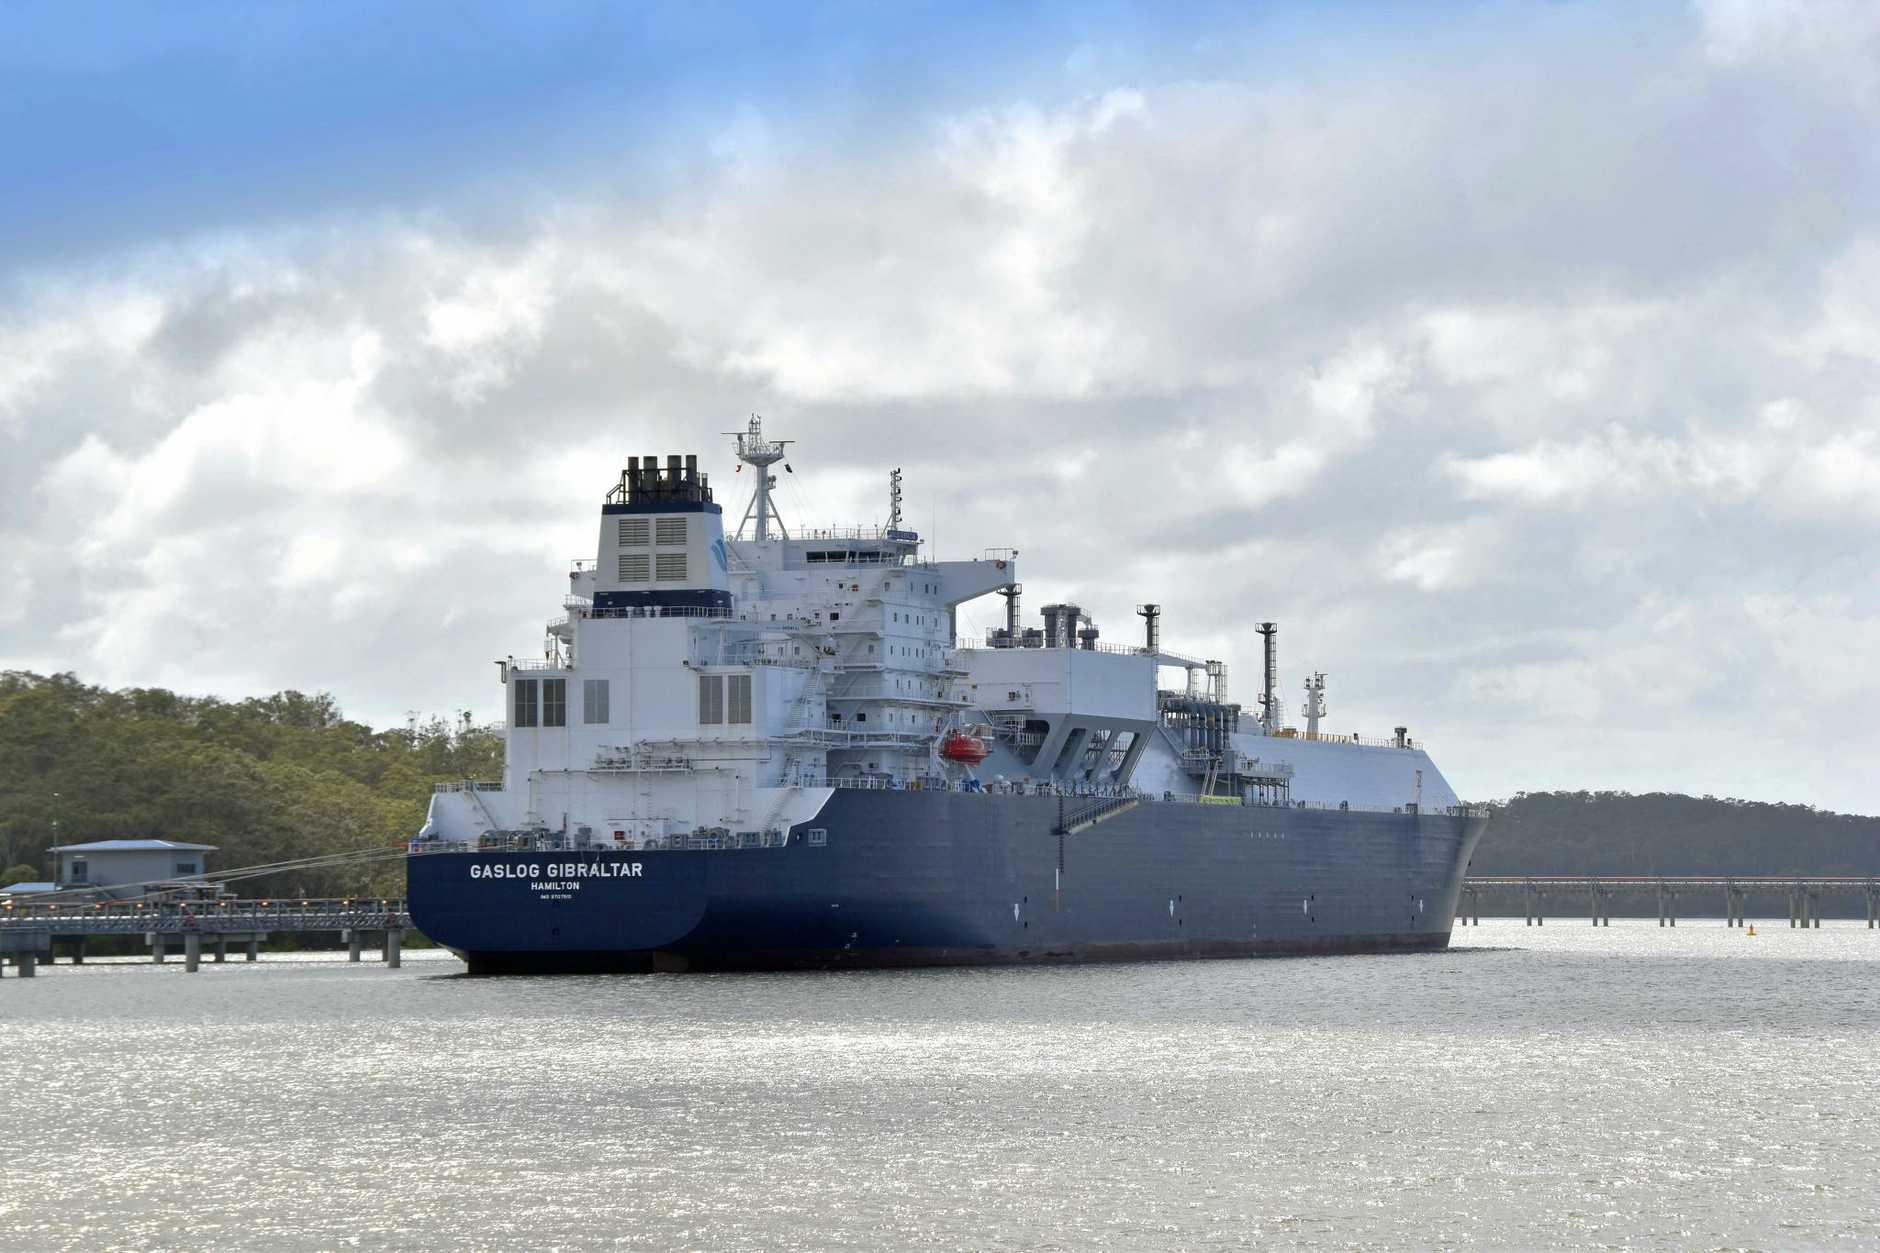 QGC Curtis Island200th LNG ship.